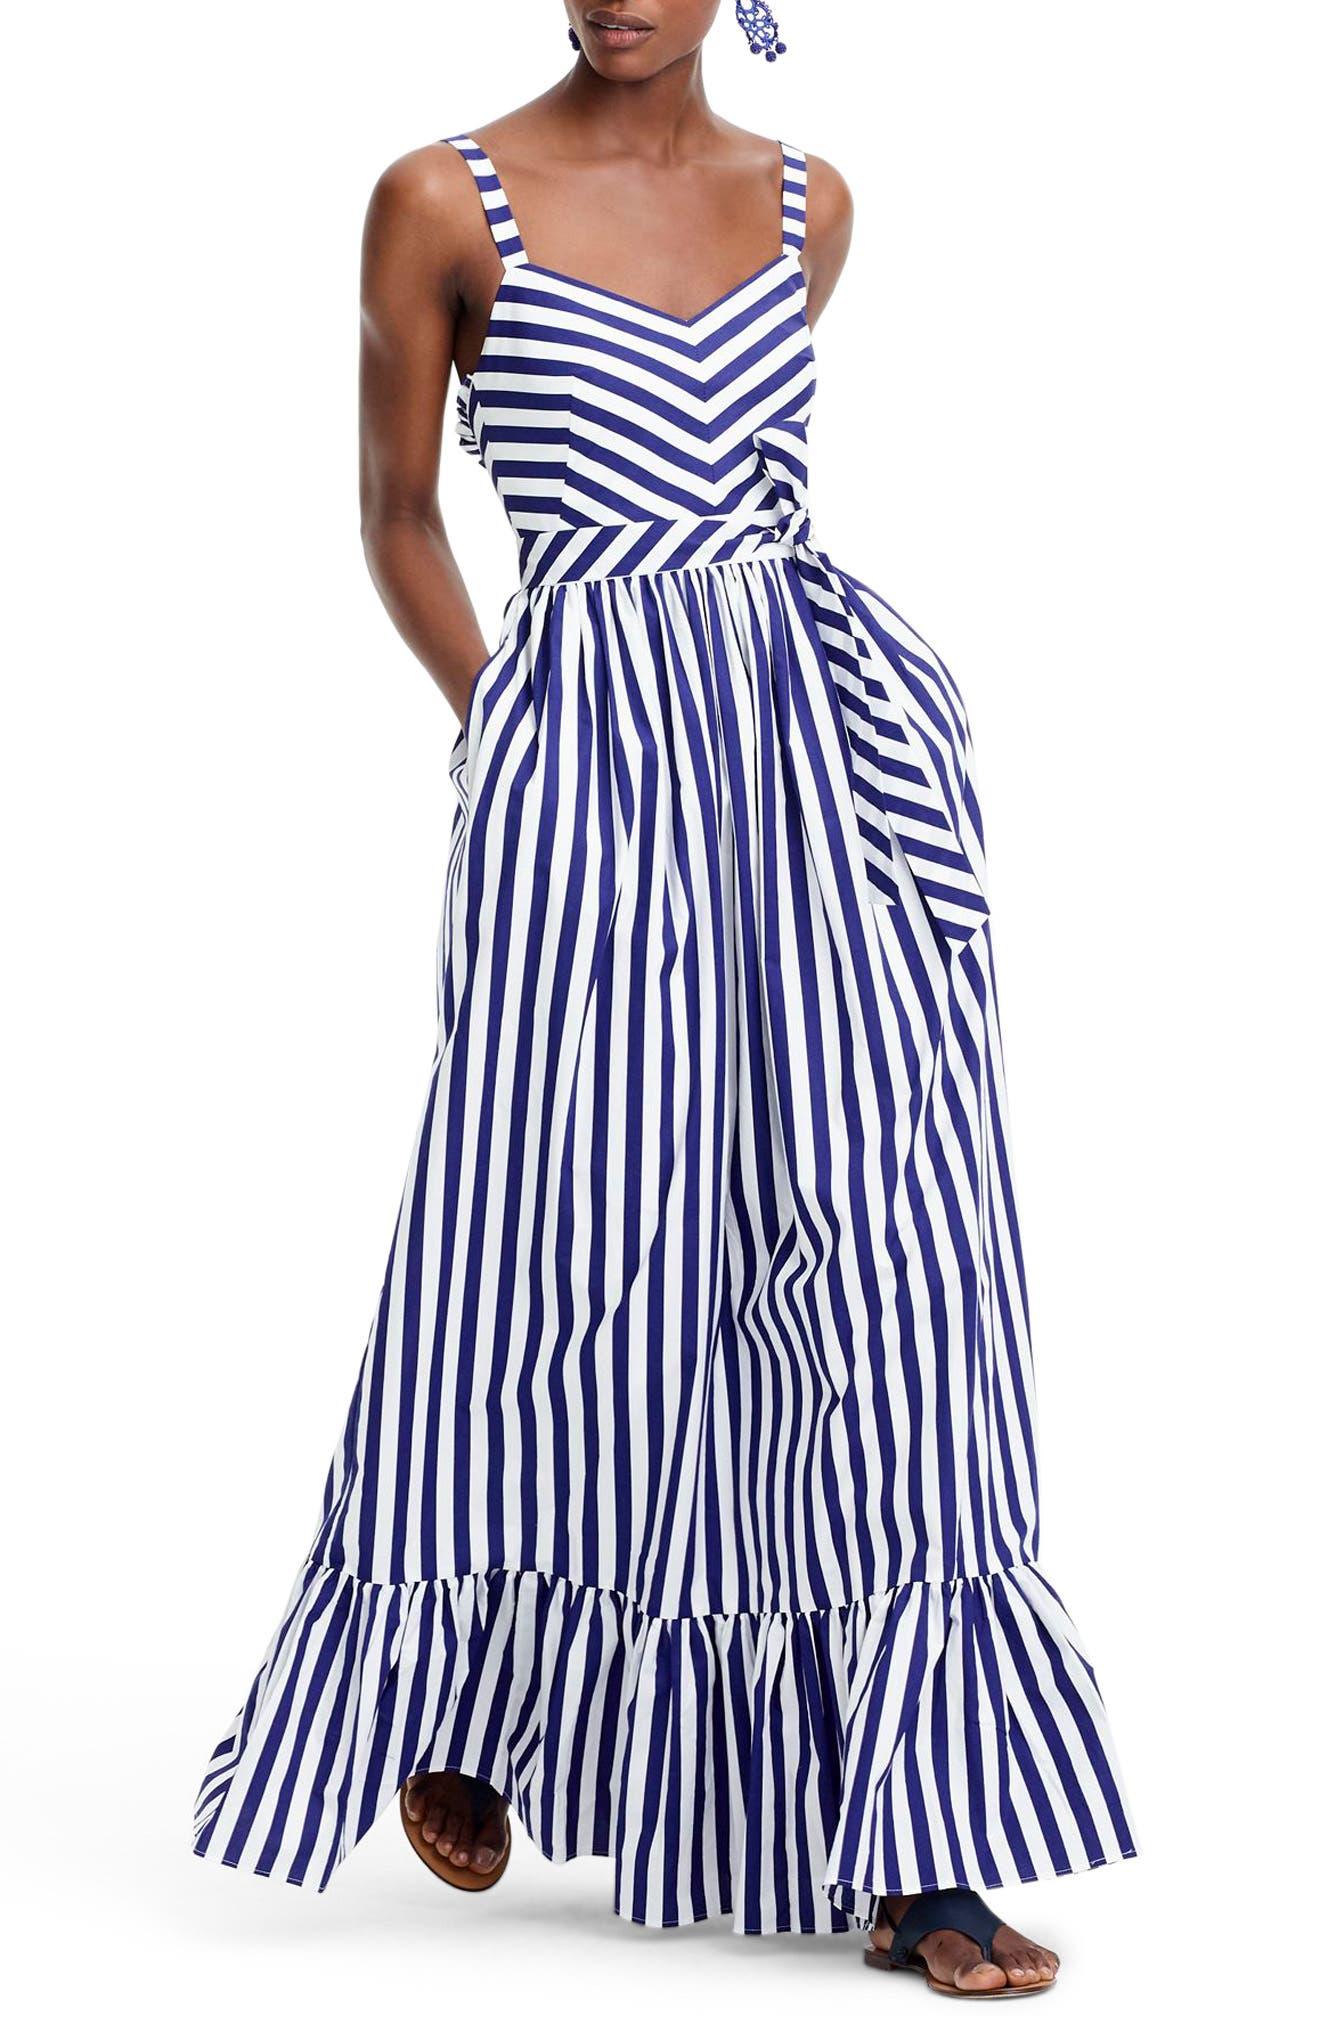 J.crew Stripe Ruffle Cotton Maxi Dress